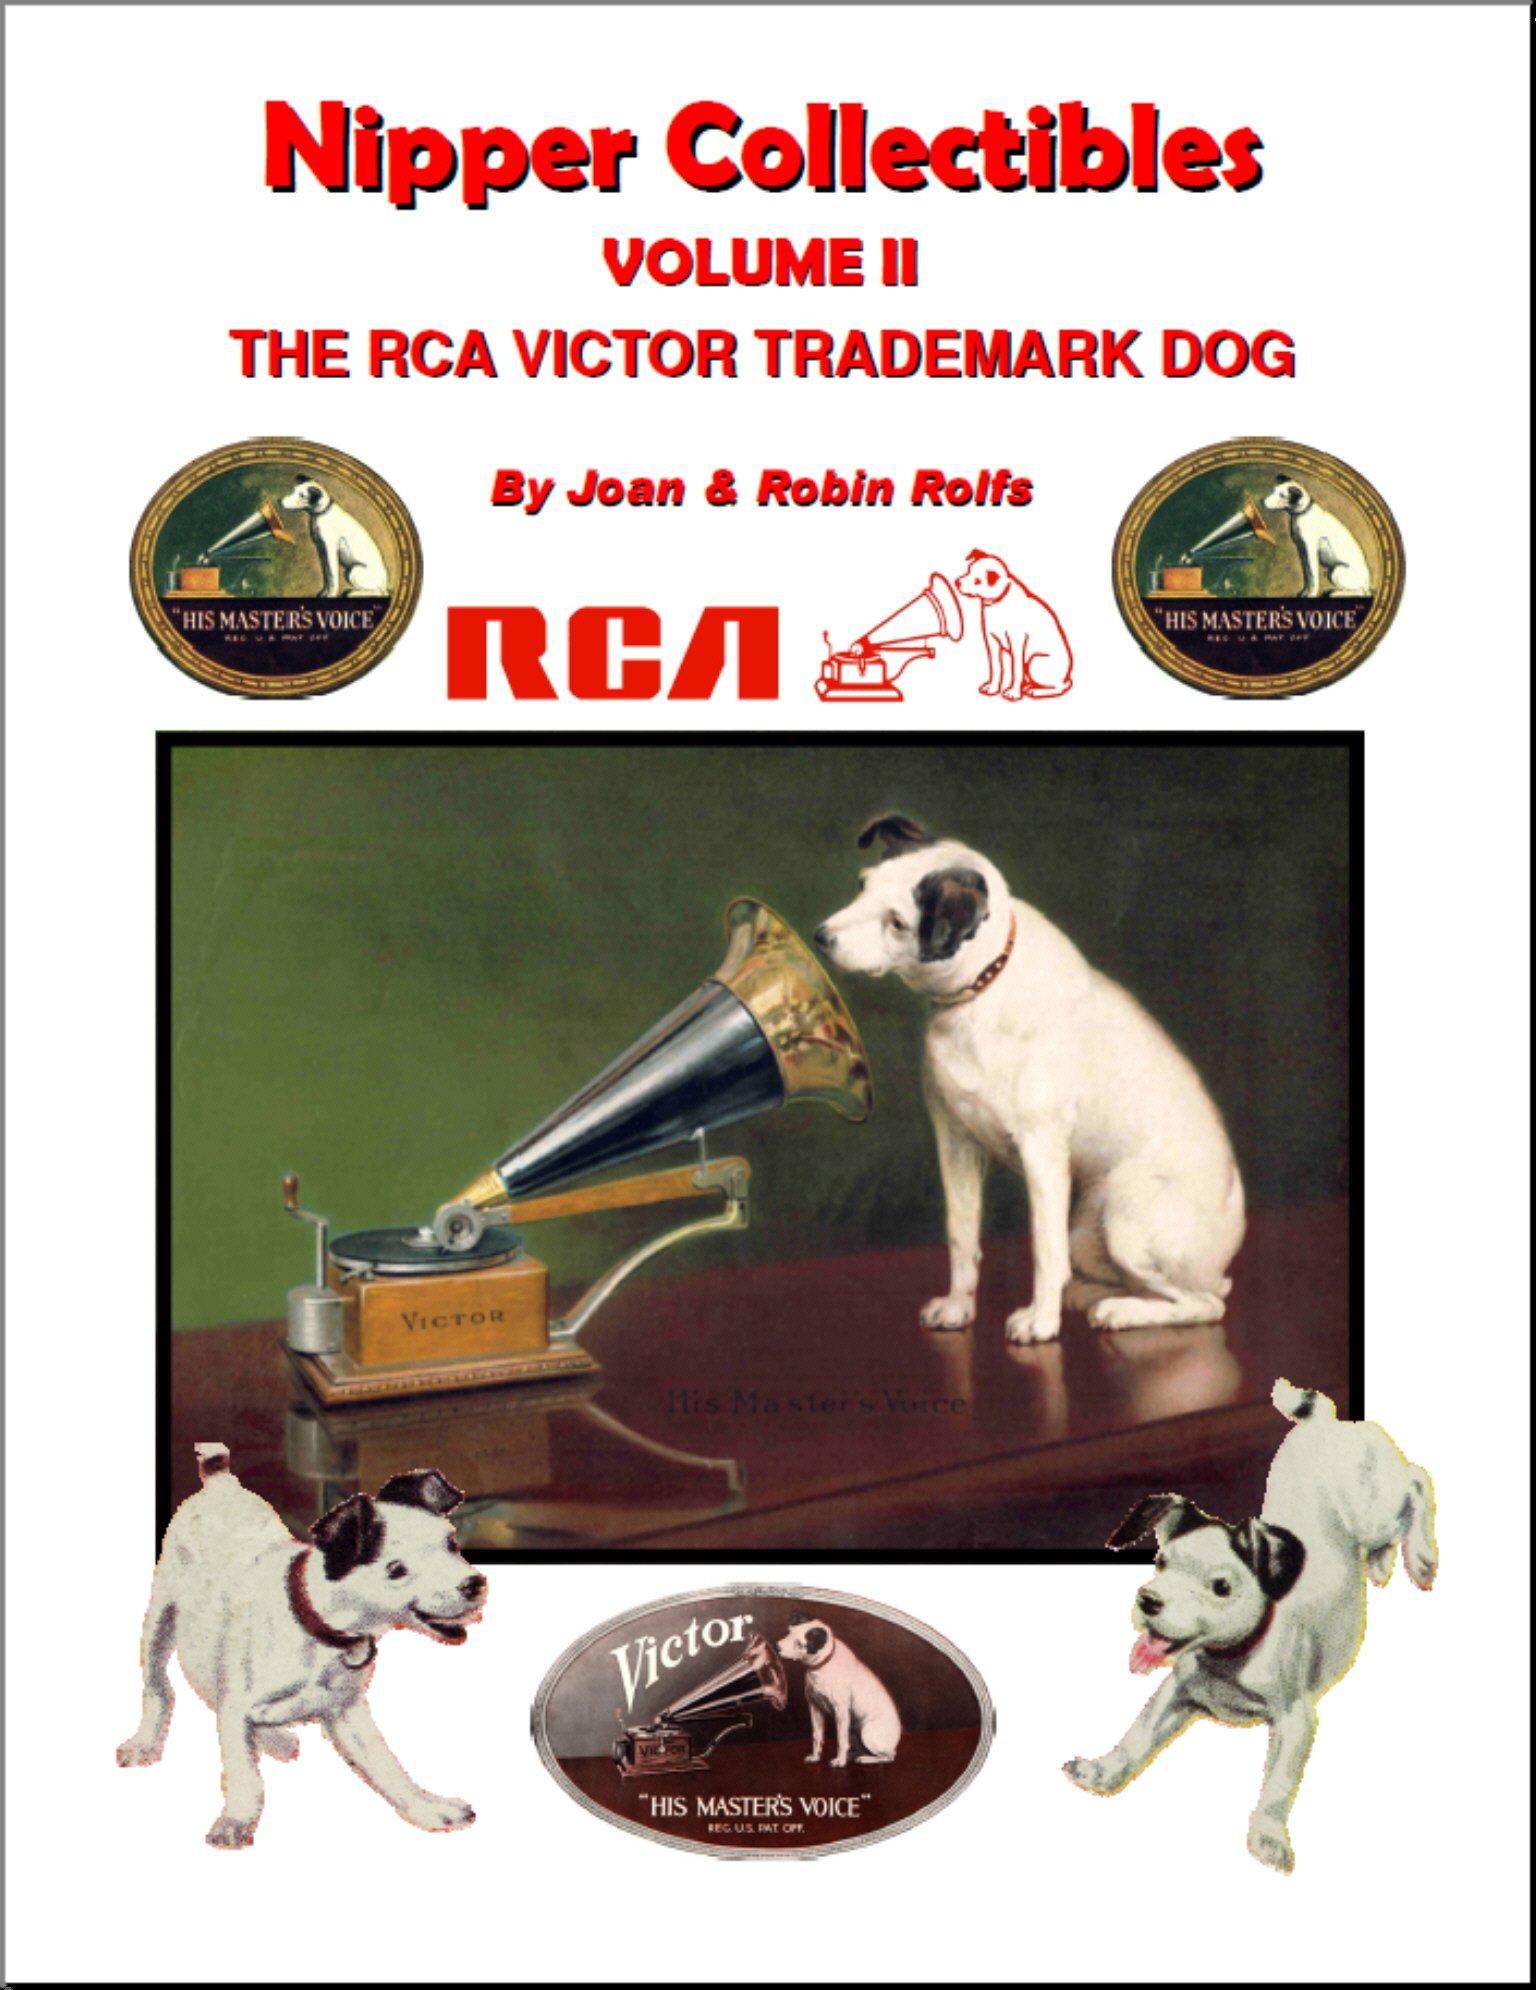 Rca nipper vintage advertising history